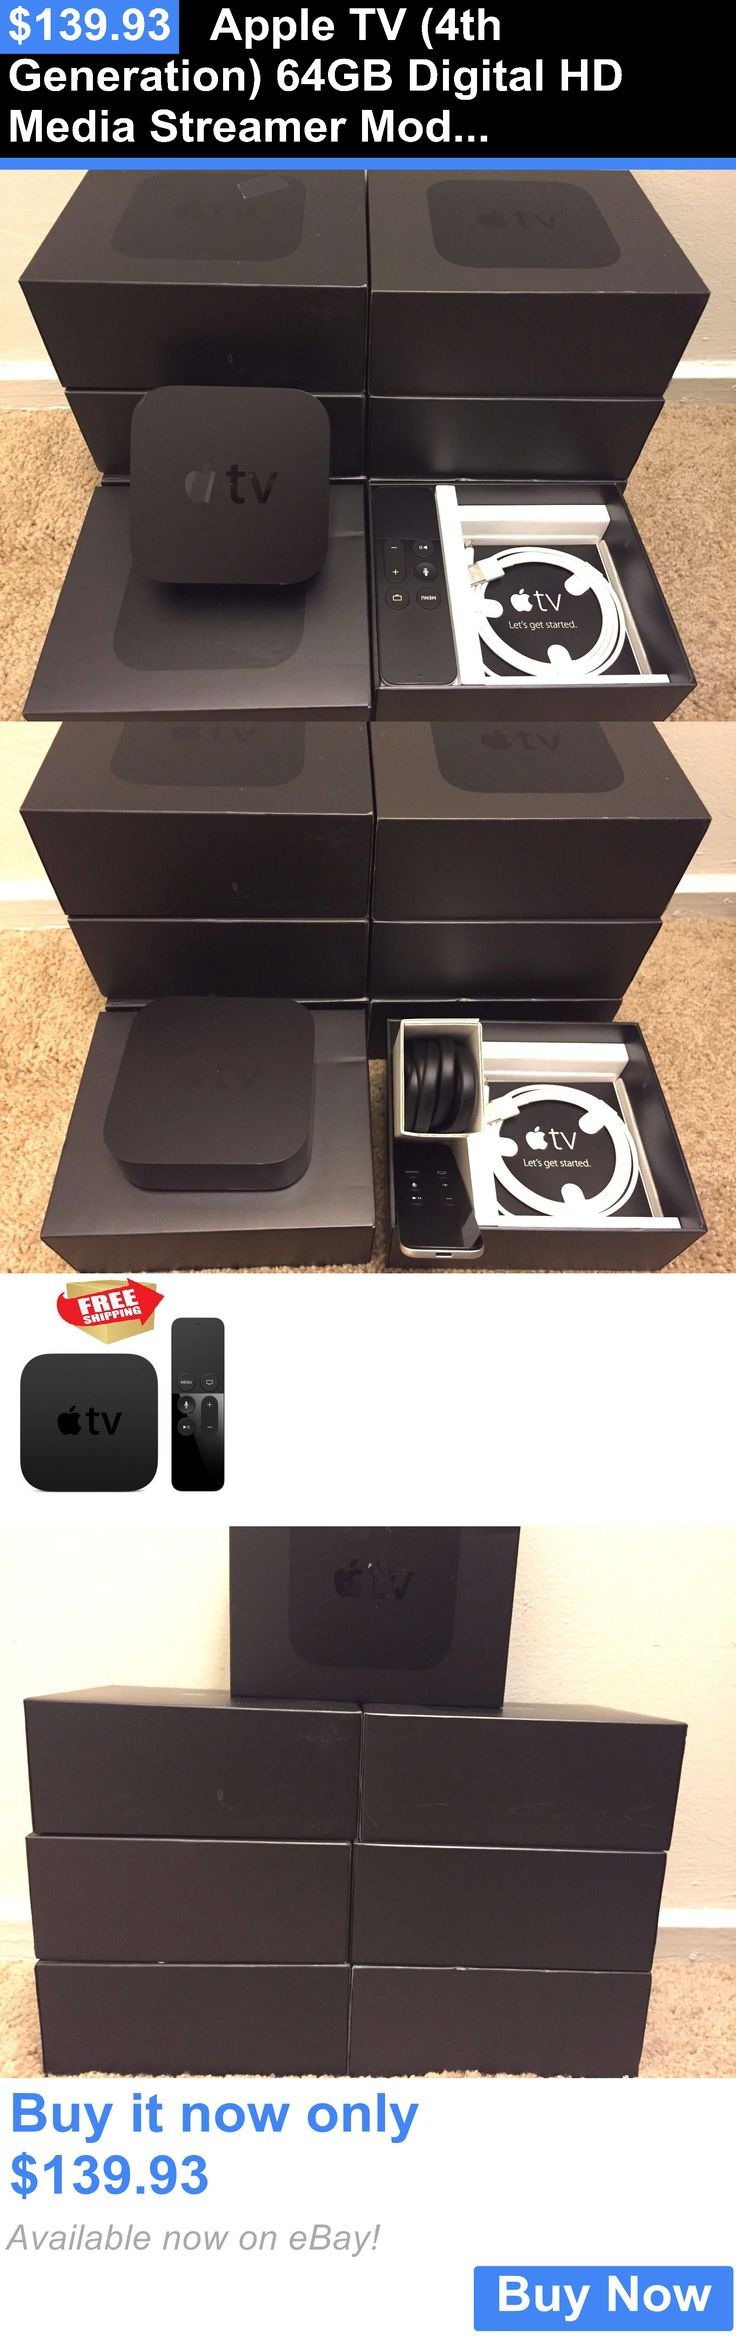 electronics: Apple Tv (4Th Generation) 64Gb Digital Hd Media Streamer Model BUY IT NOW ONLY: $139.93